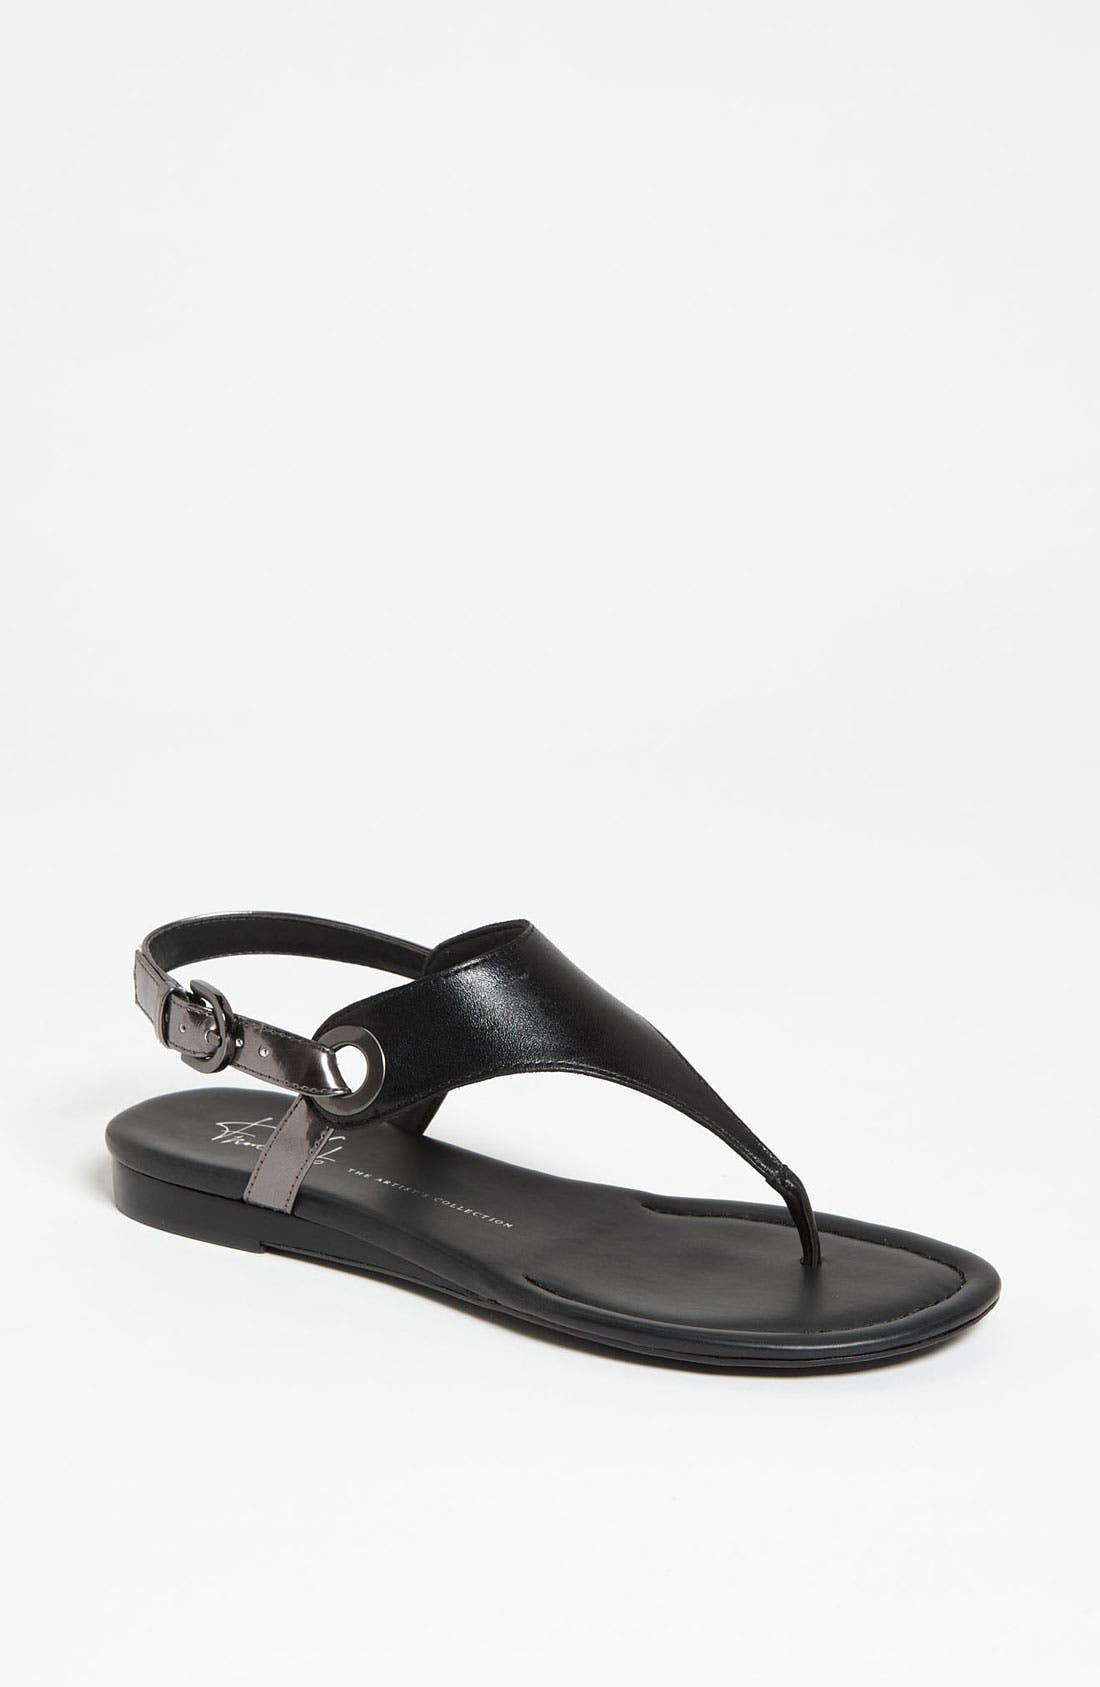 Alternate Image 1 Selected - Franco Sarto 'Grip' Sandal